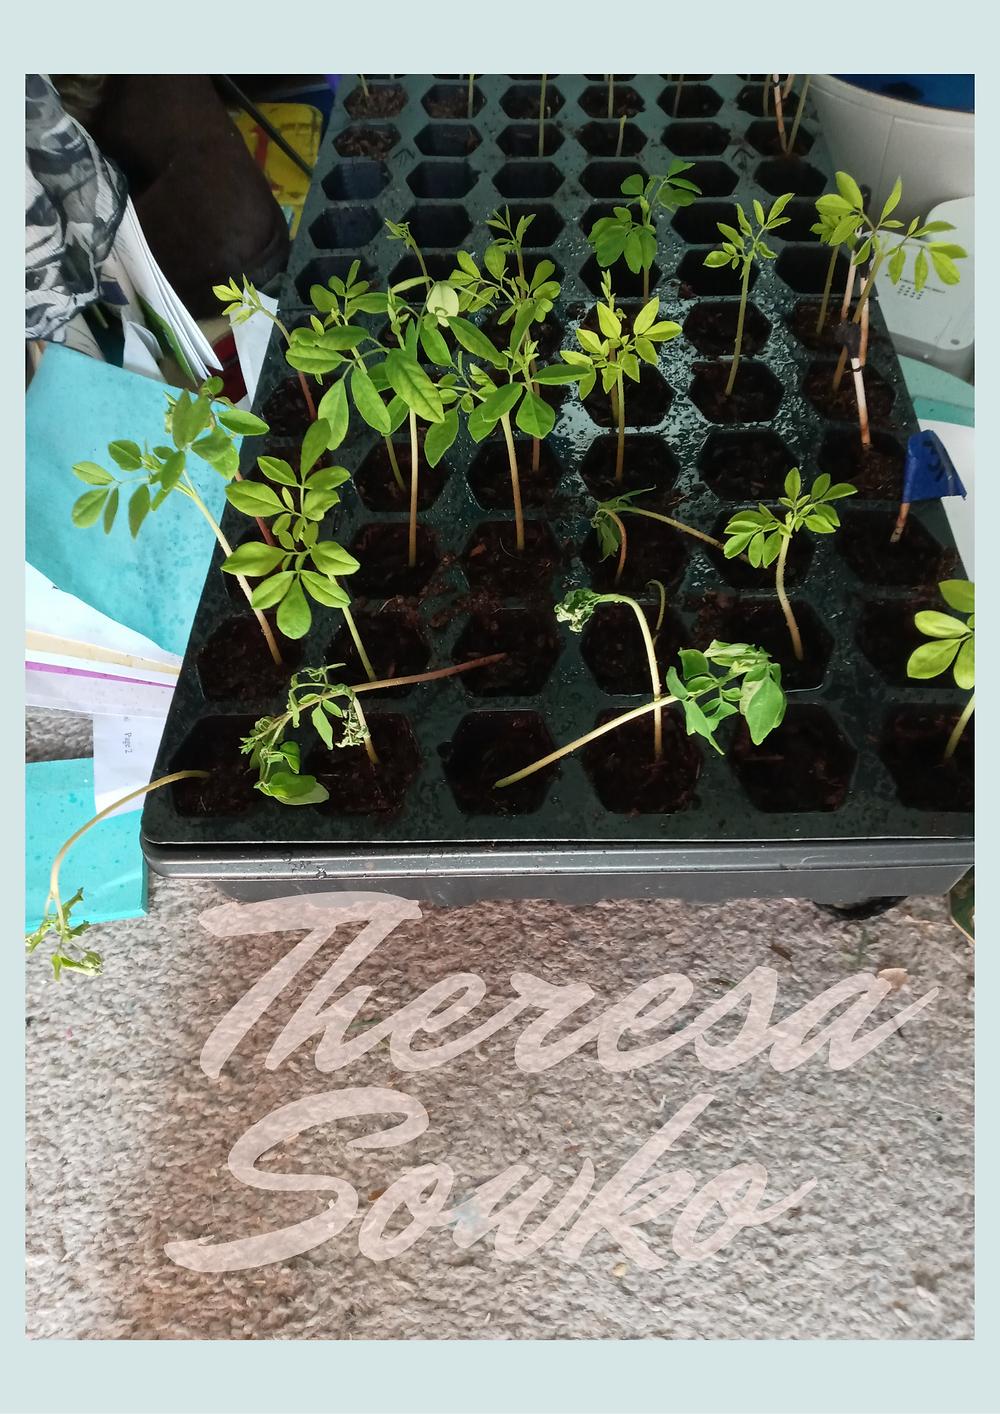 Moringa Seedlings that were left in the sun too long, lean over